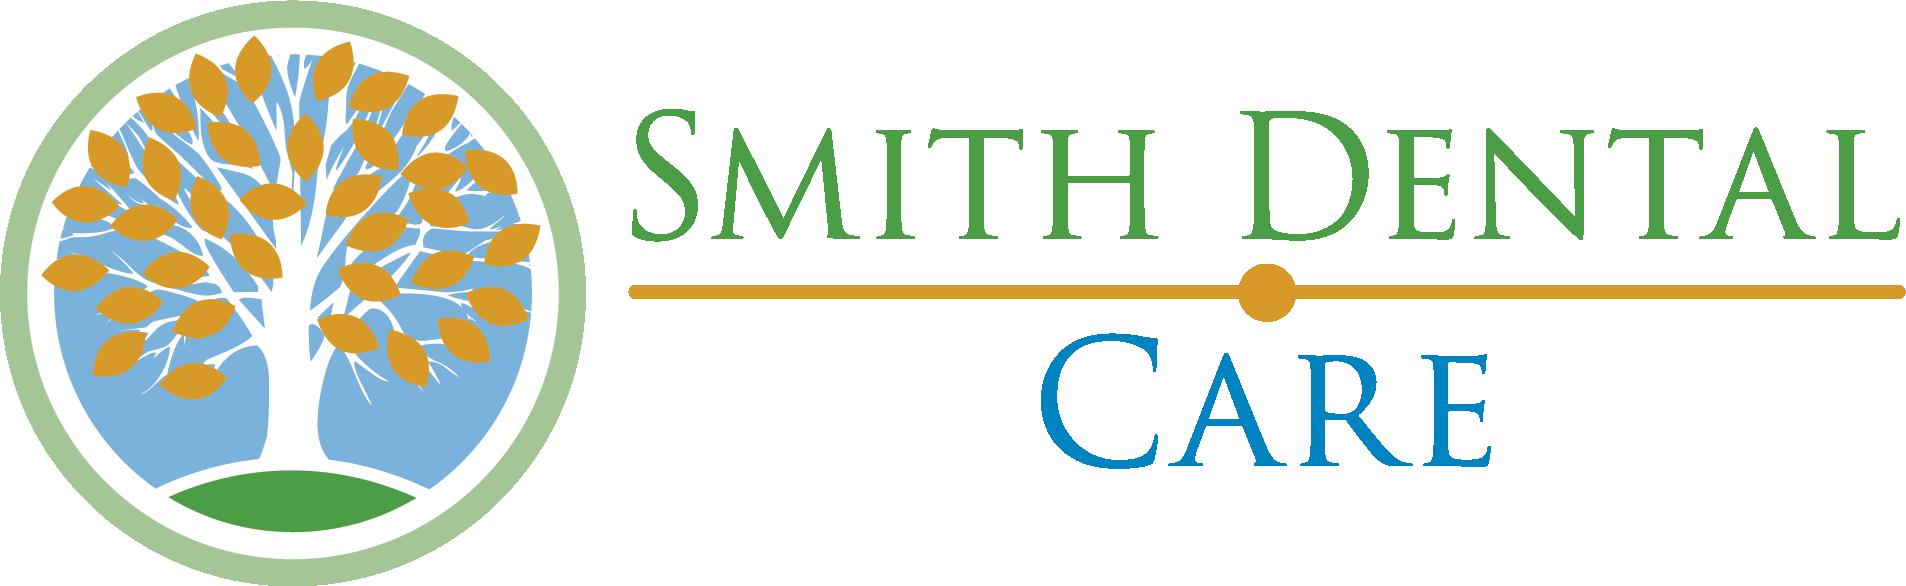 Smith Dental Care of Athens Athens (706)389-1301